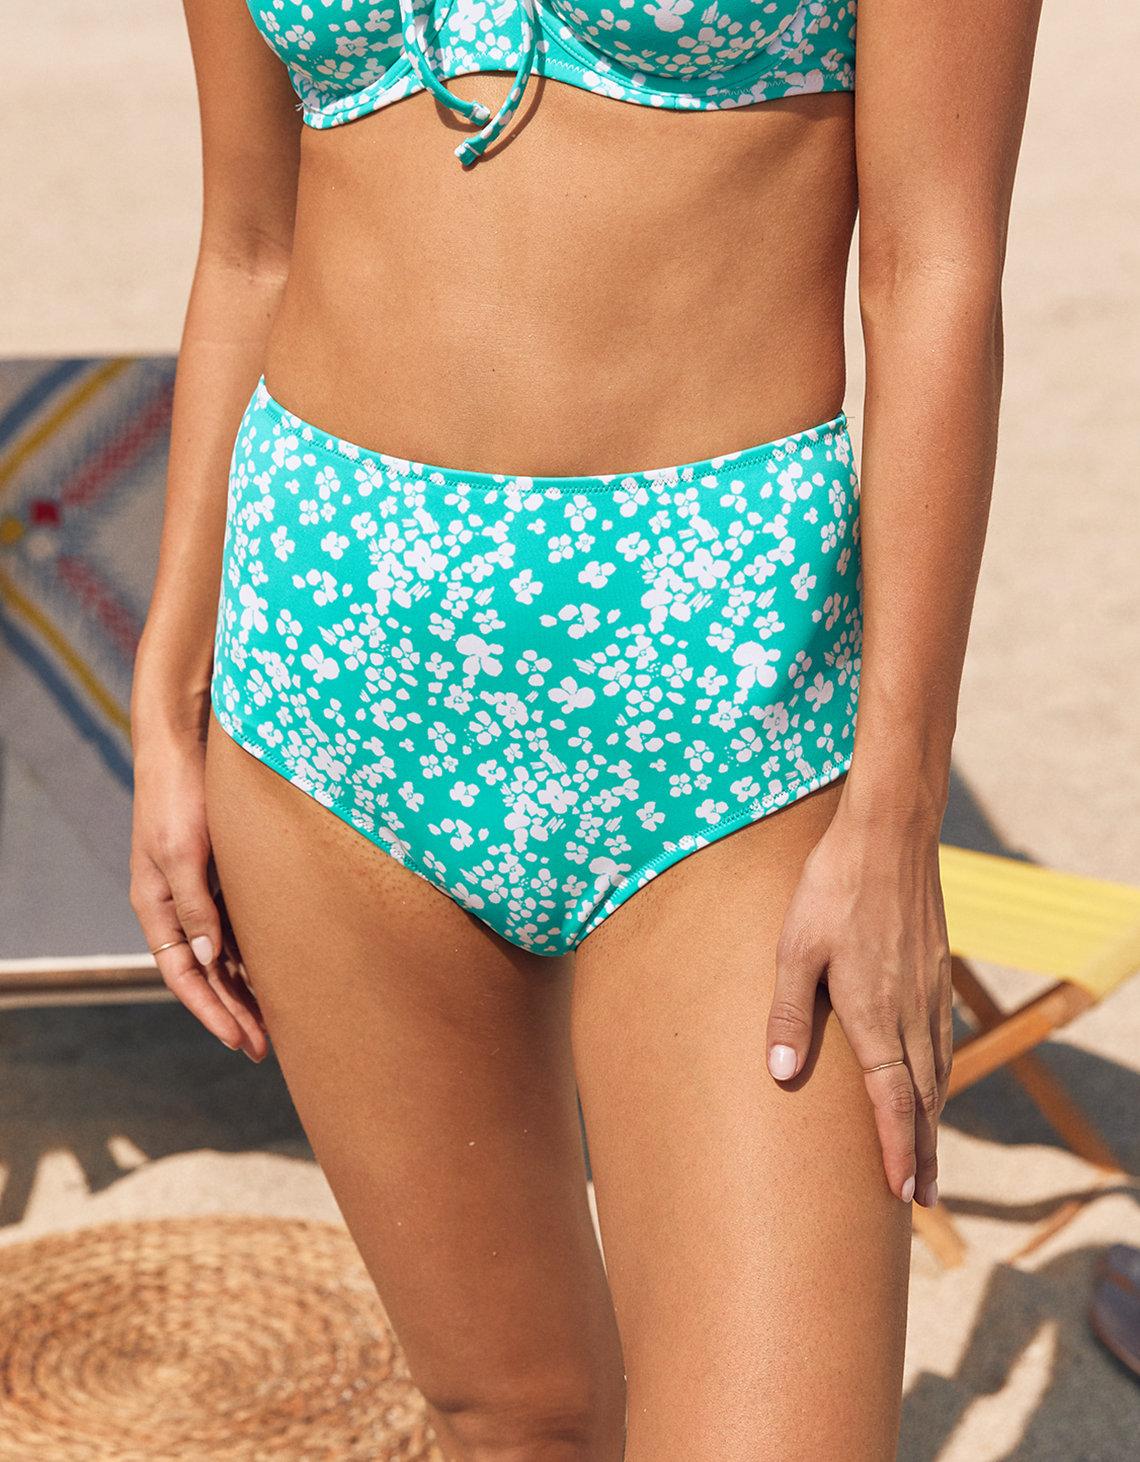 cb0039db8faec Aerie High Waisted Cheeky Bikini Bottom. Placeholder image. Product Image